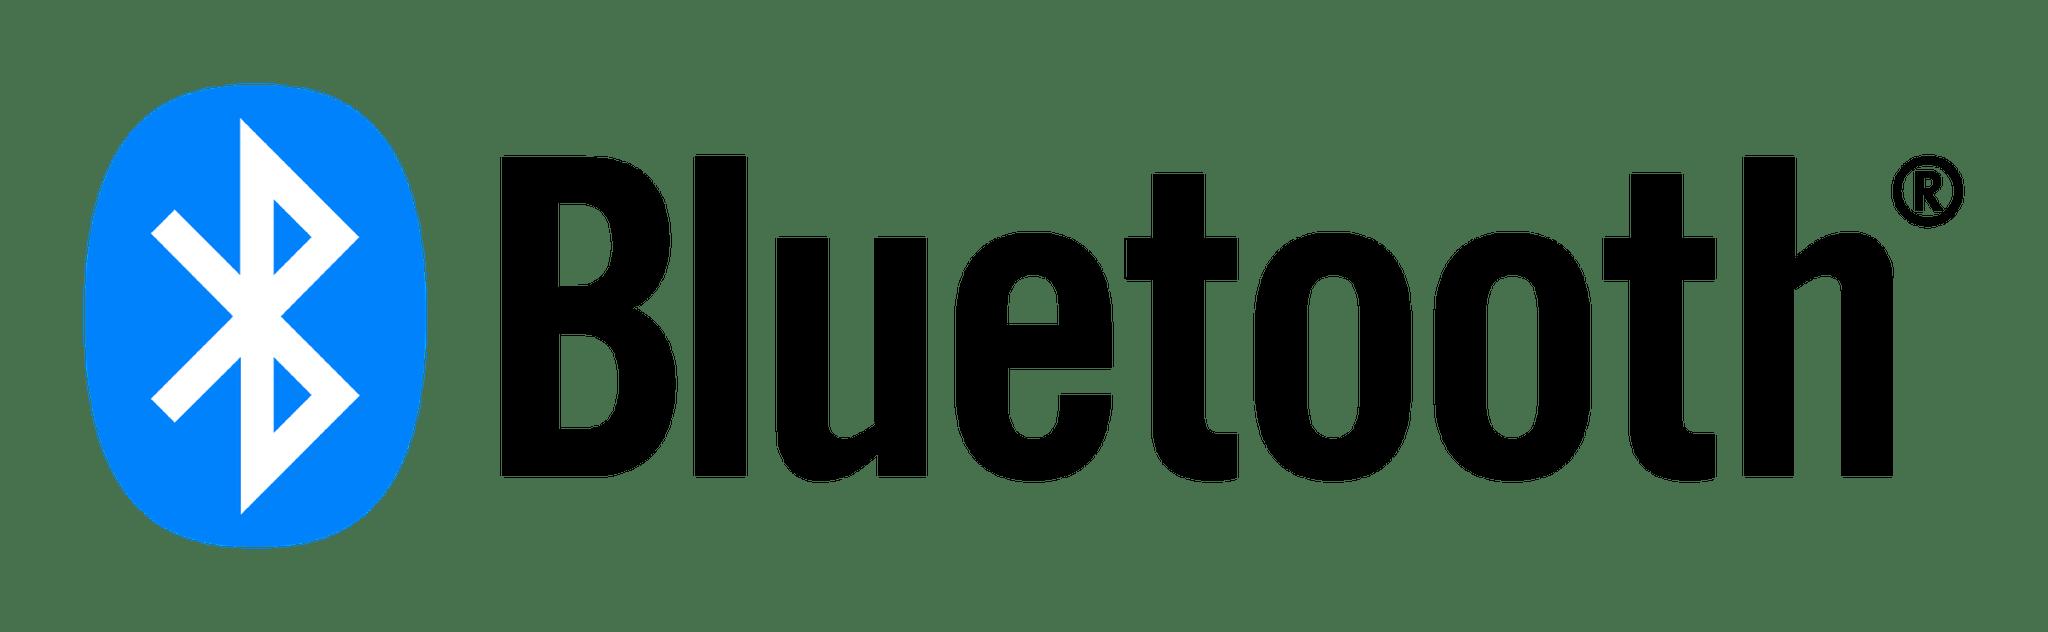 Bluetooth Headline Sponsor